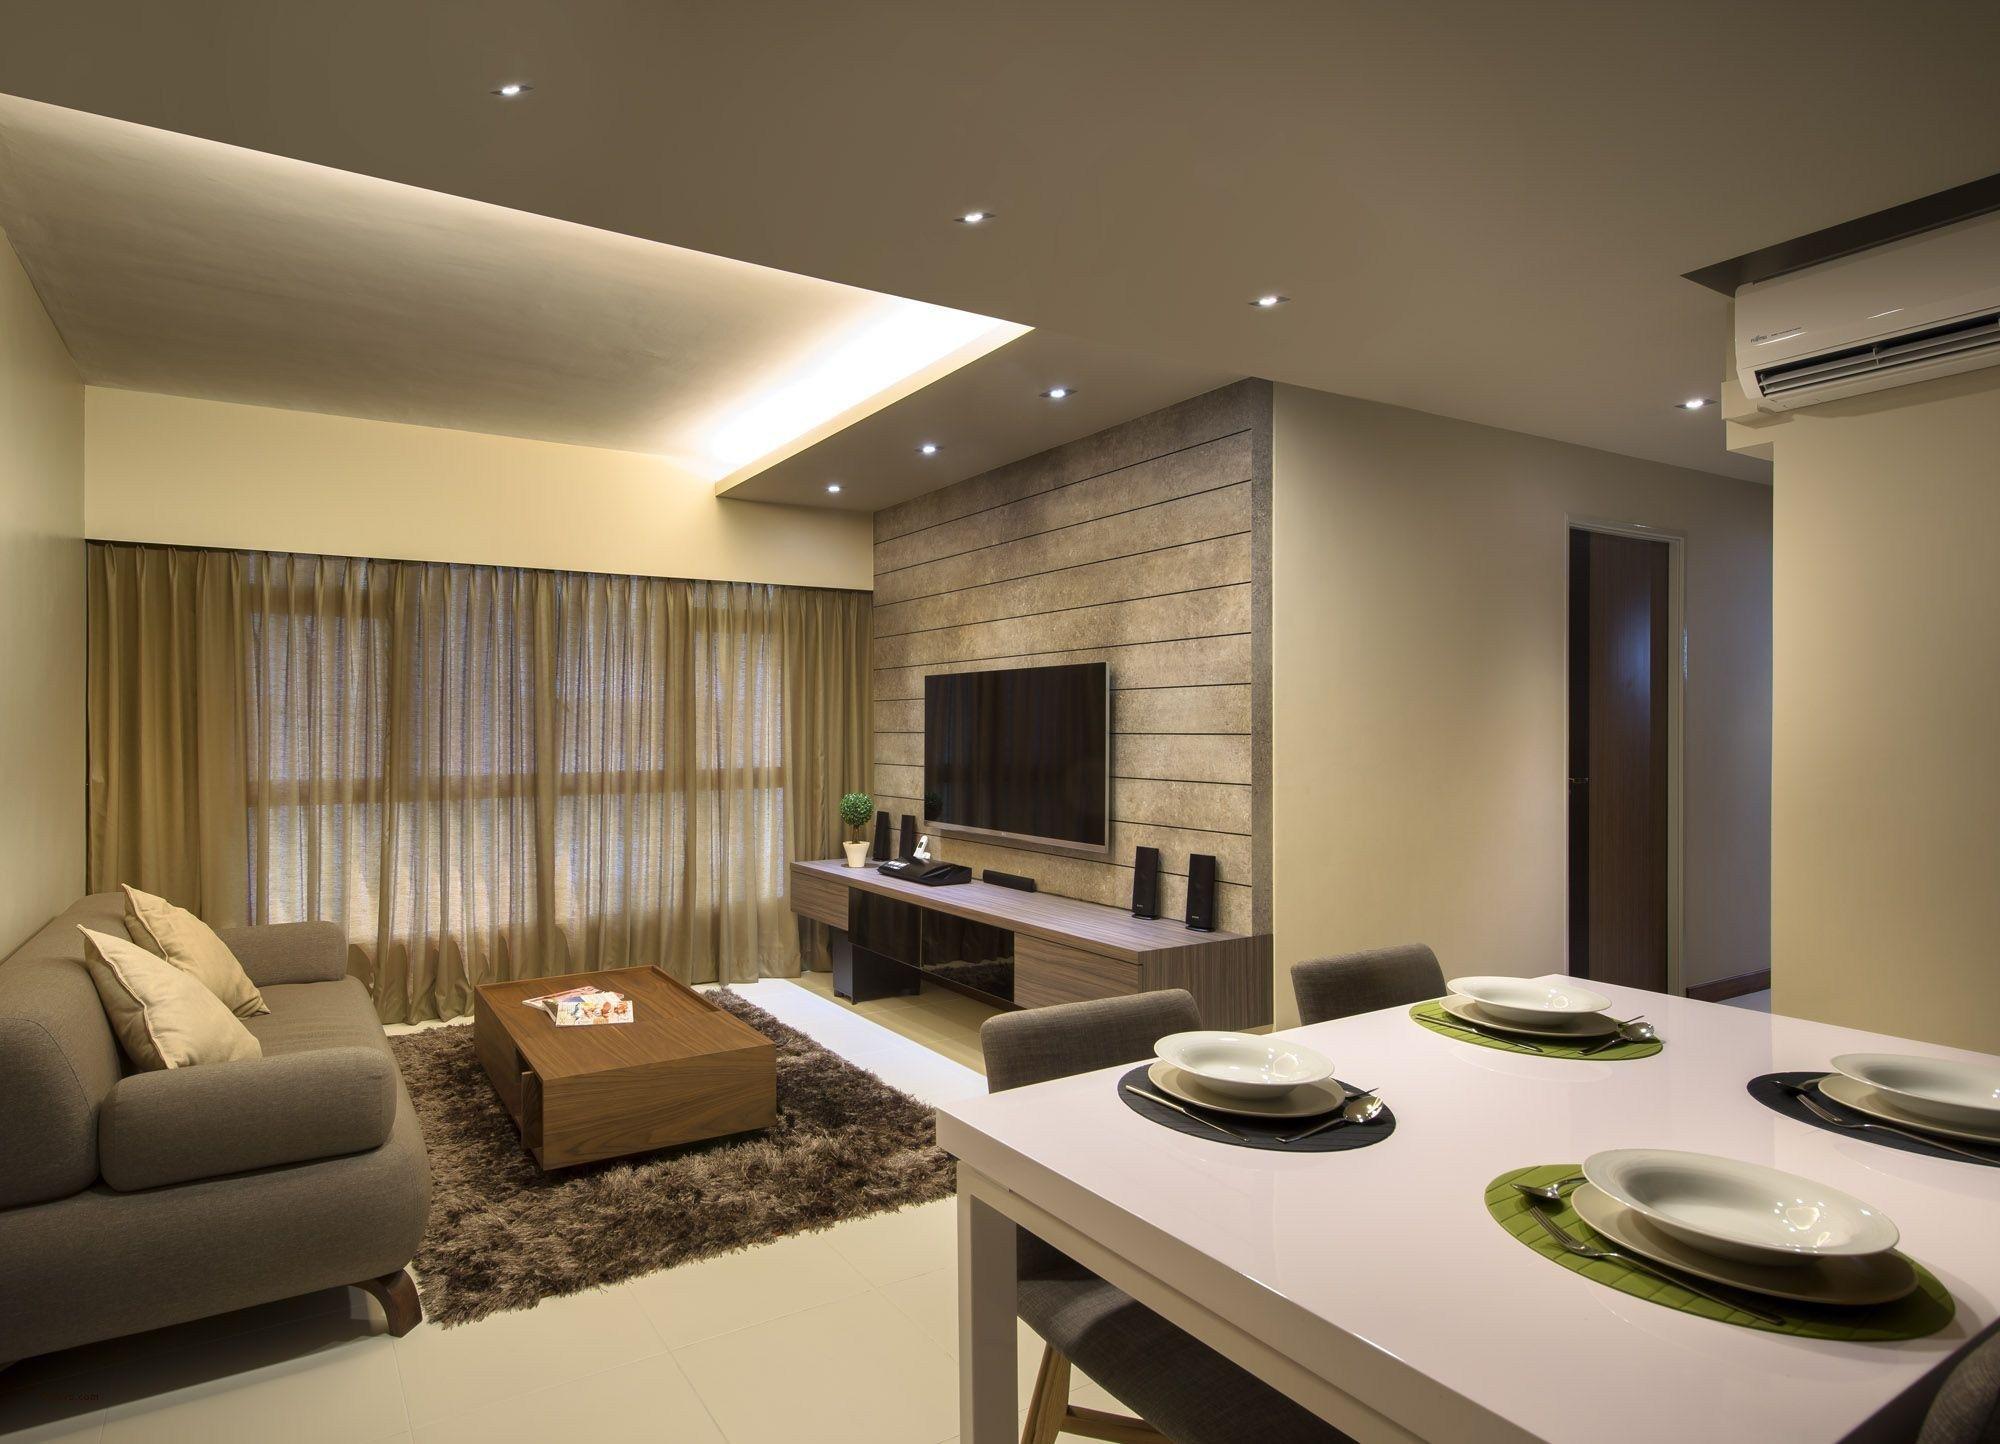 Living Room Lighting Ideas Singapore Beautiful Hdb Simple Lighting Living Rm Lighting Home Interior Design Interior Design Singapore False Ceiling Living Room